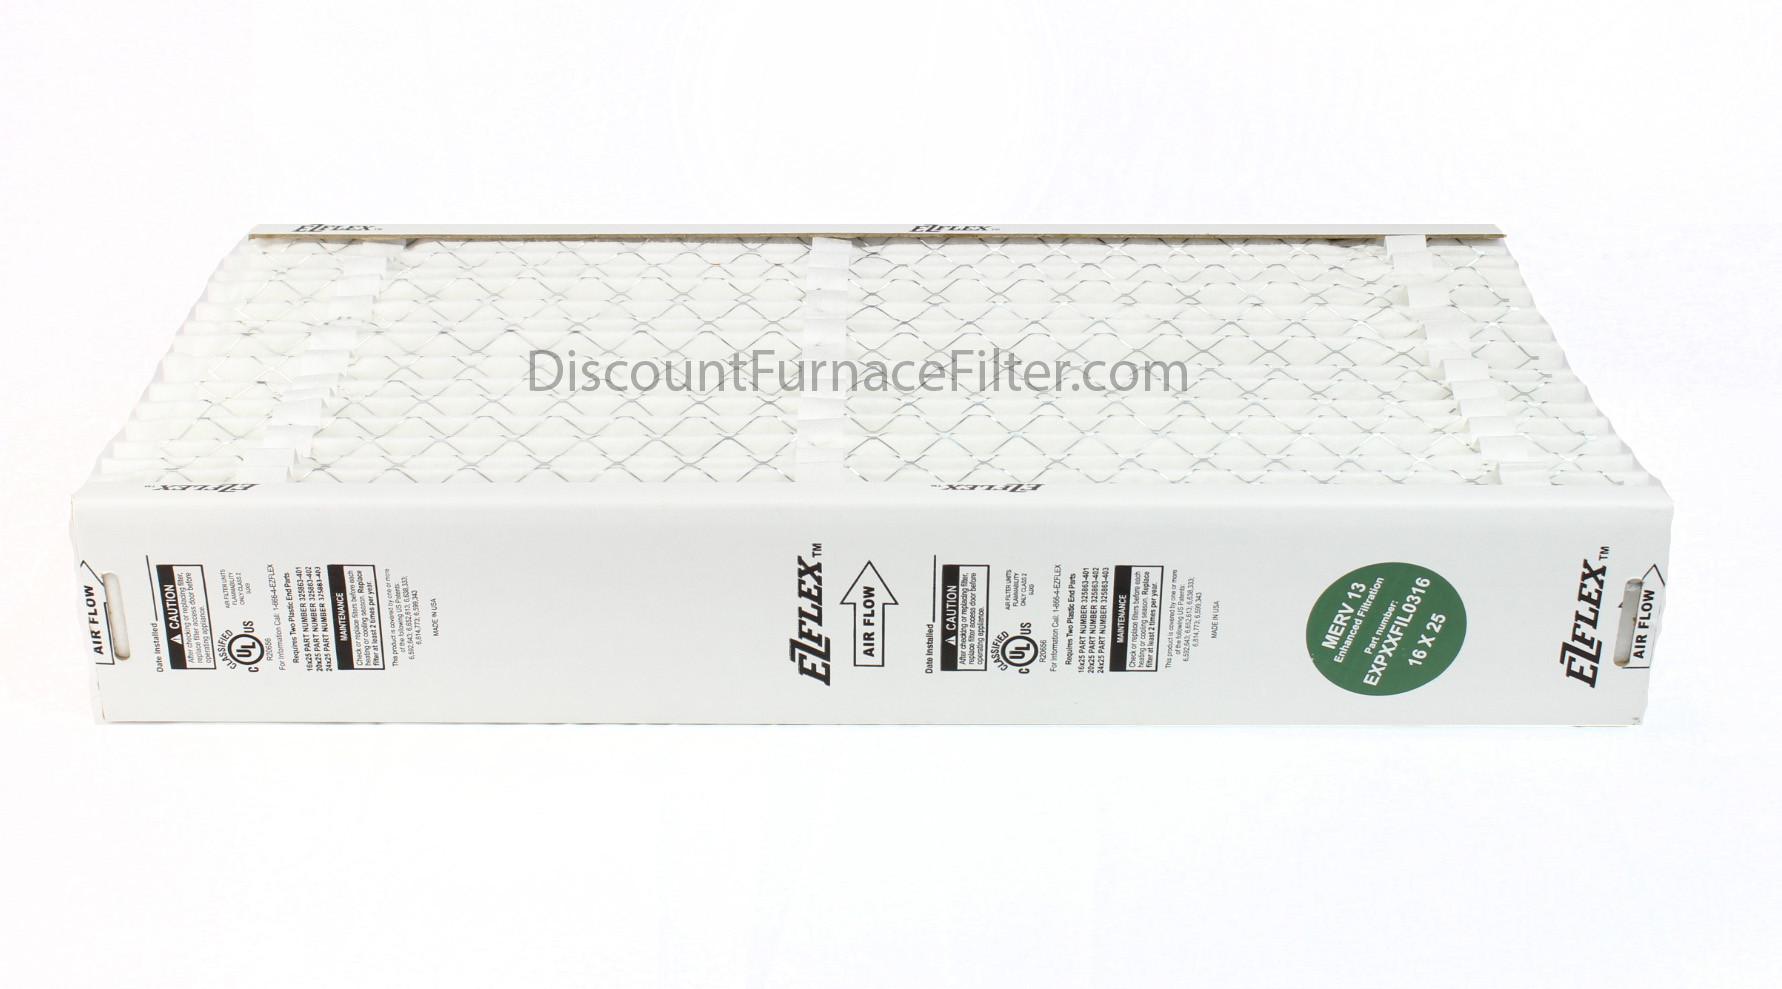 "Carrier EXPXXFIL0316 - EZ Flex 16"" Expandable Air Filter Merv 13 - Filter Only"